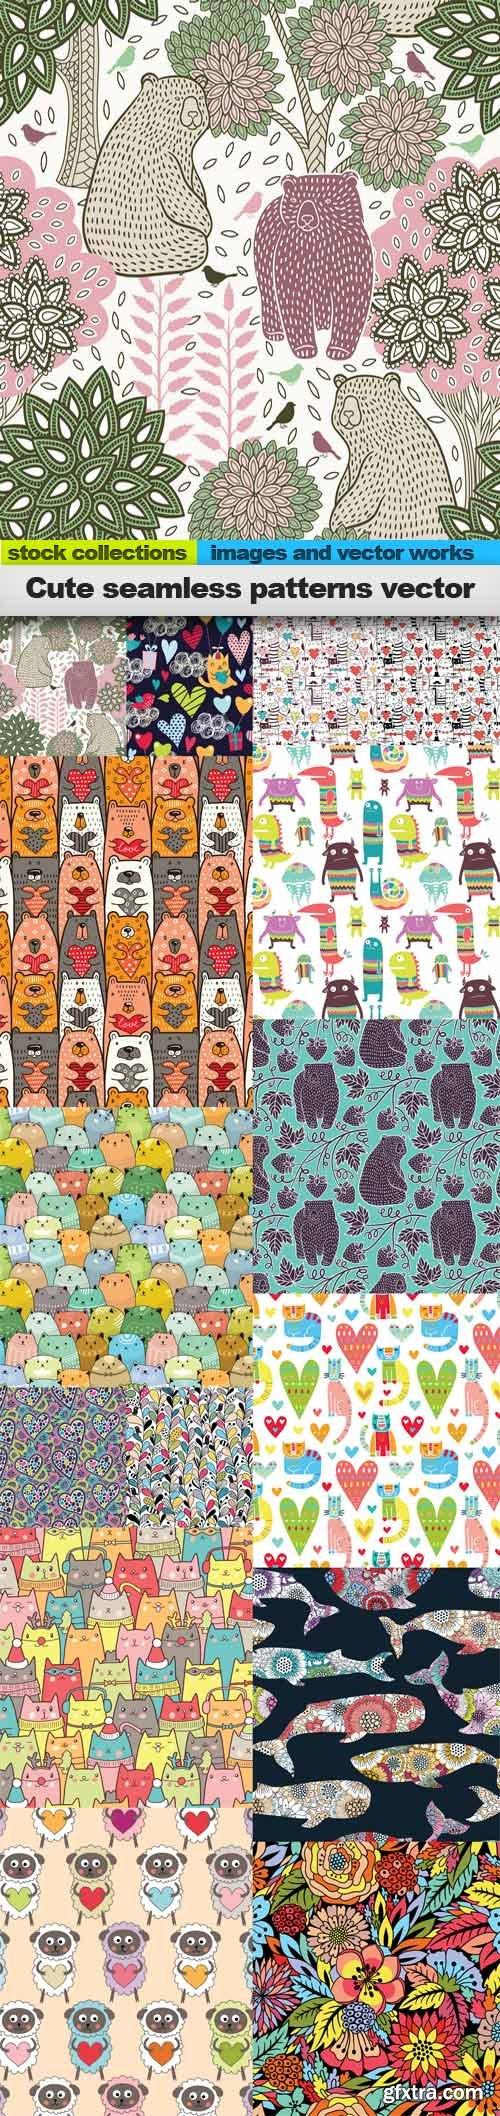 Cute seamless patterns vector, 15 x EPS